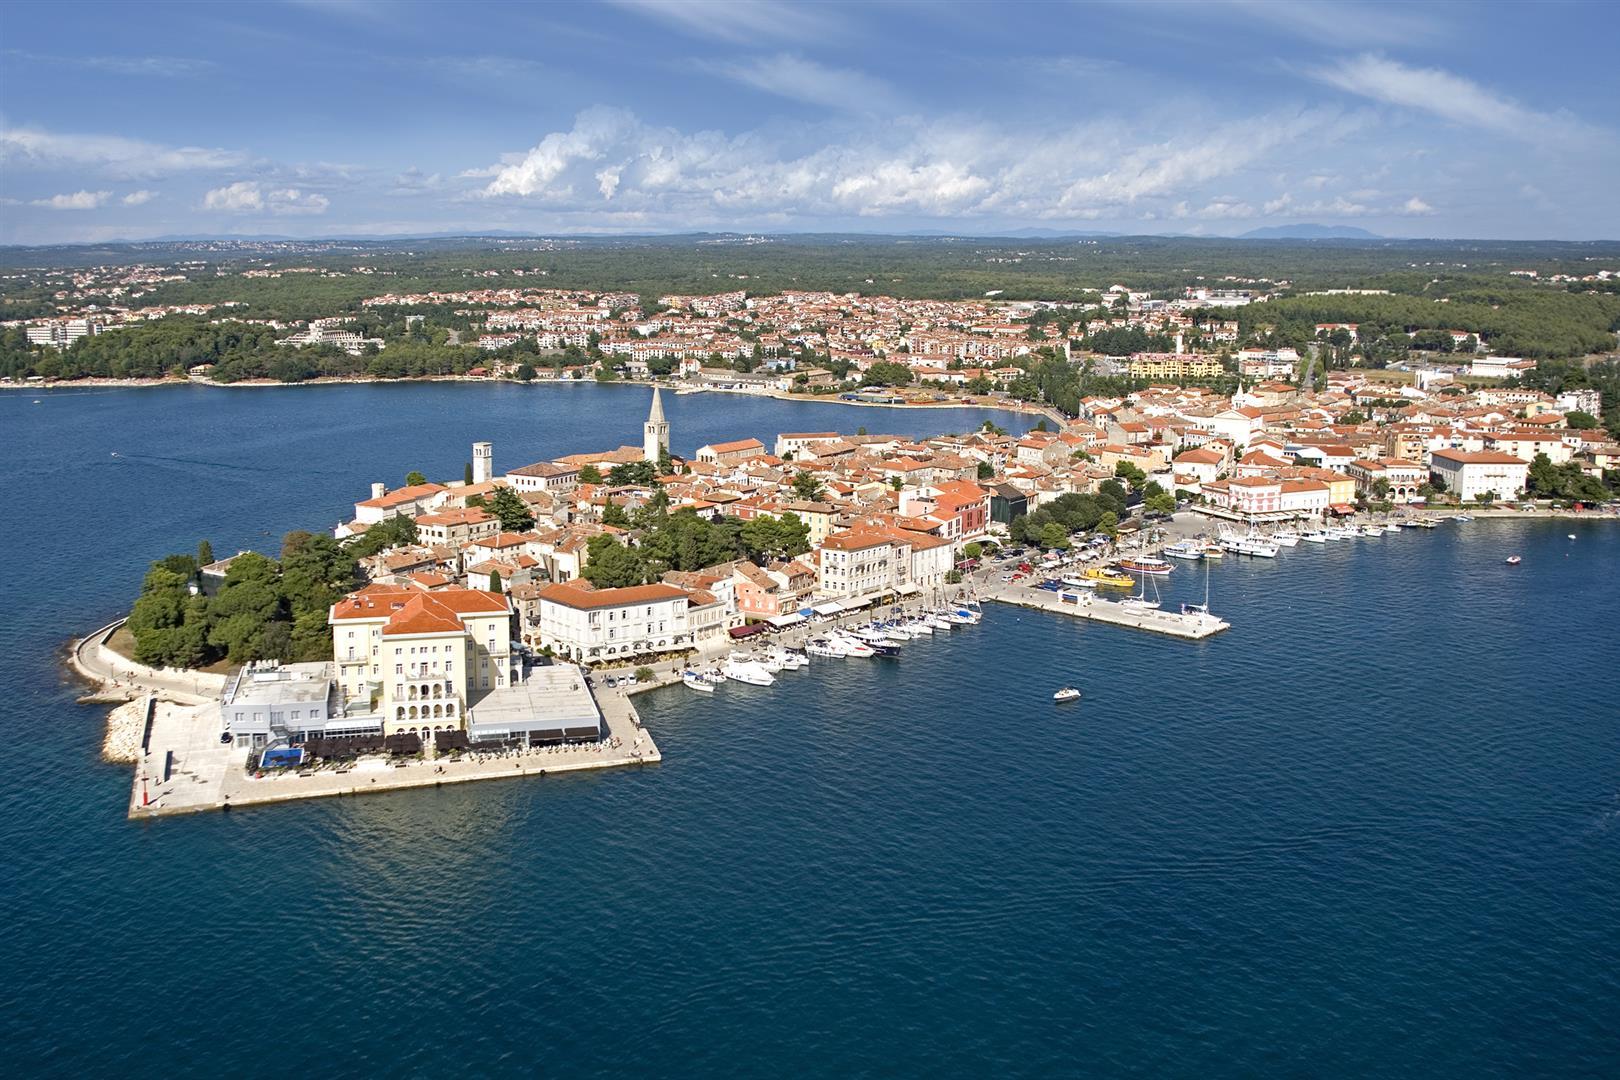 Istrien Karte Zum Ausdrucken.Porec Kroatien Reisefuhrer Kroati De